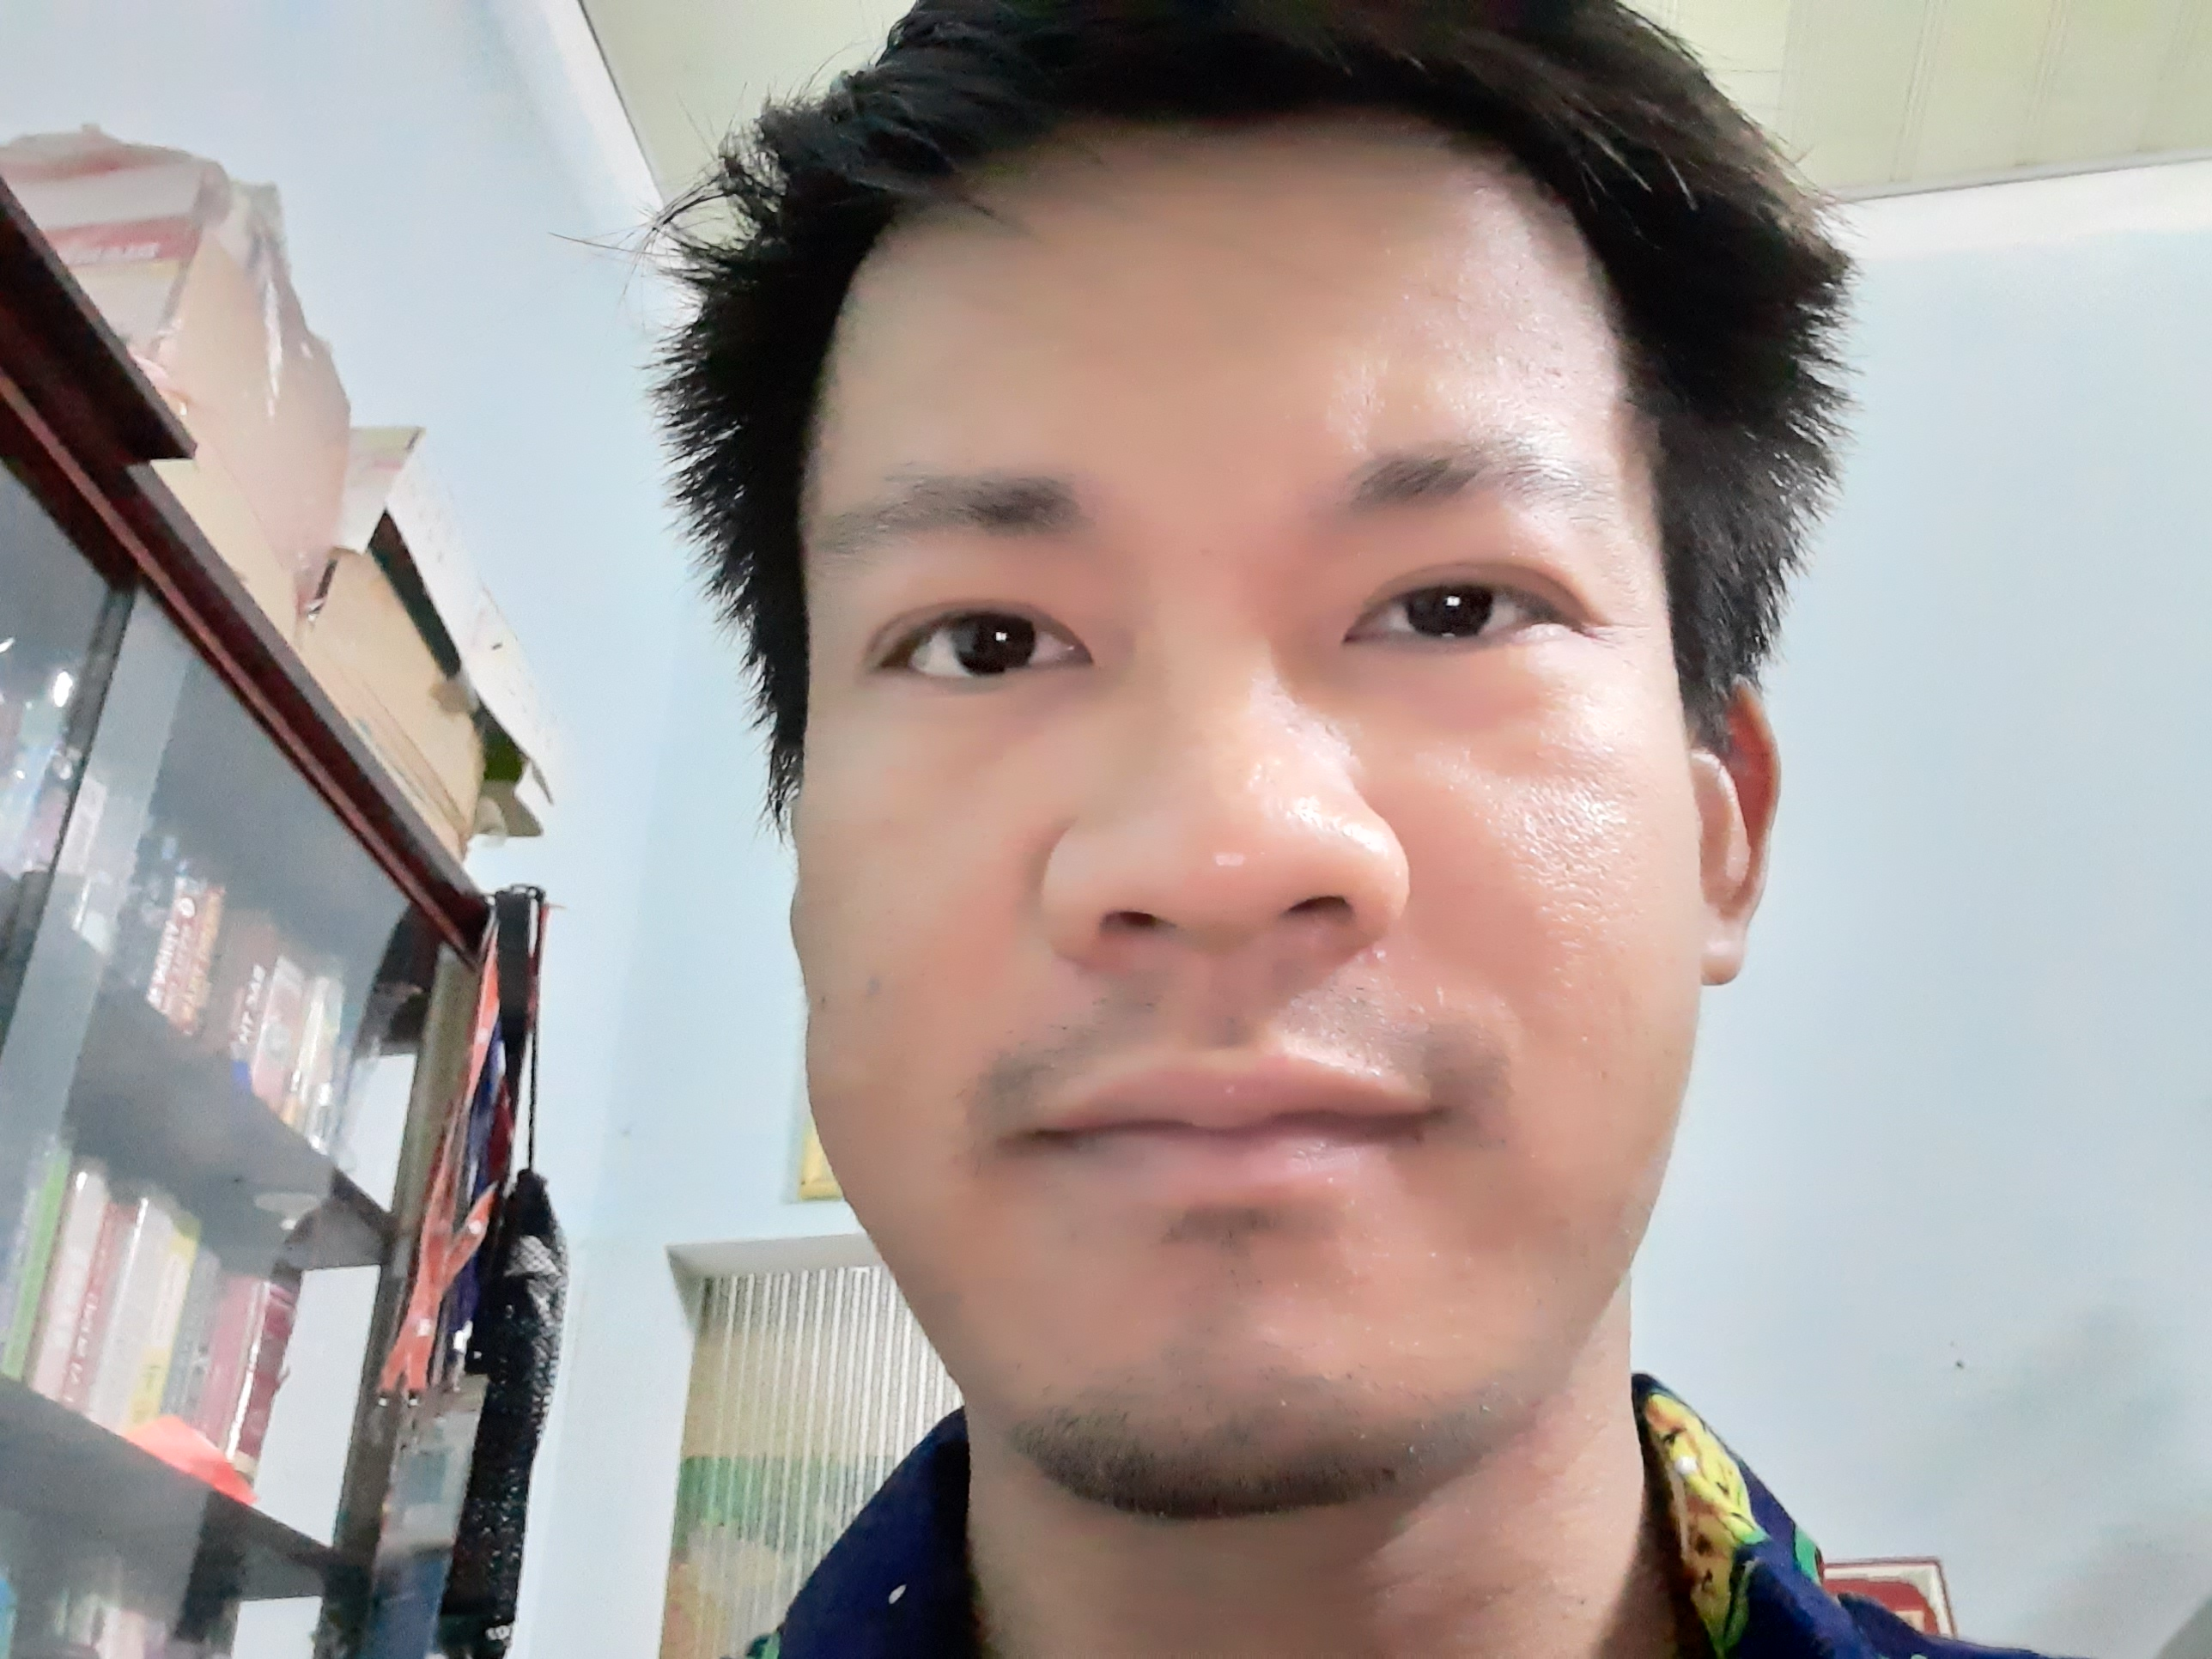 Phan ngọc Tuấn